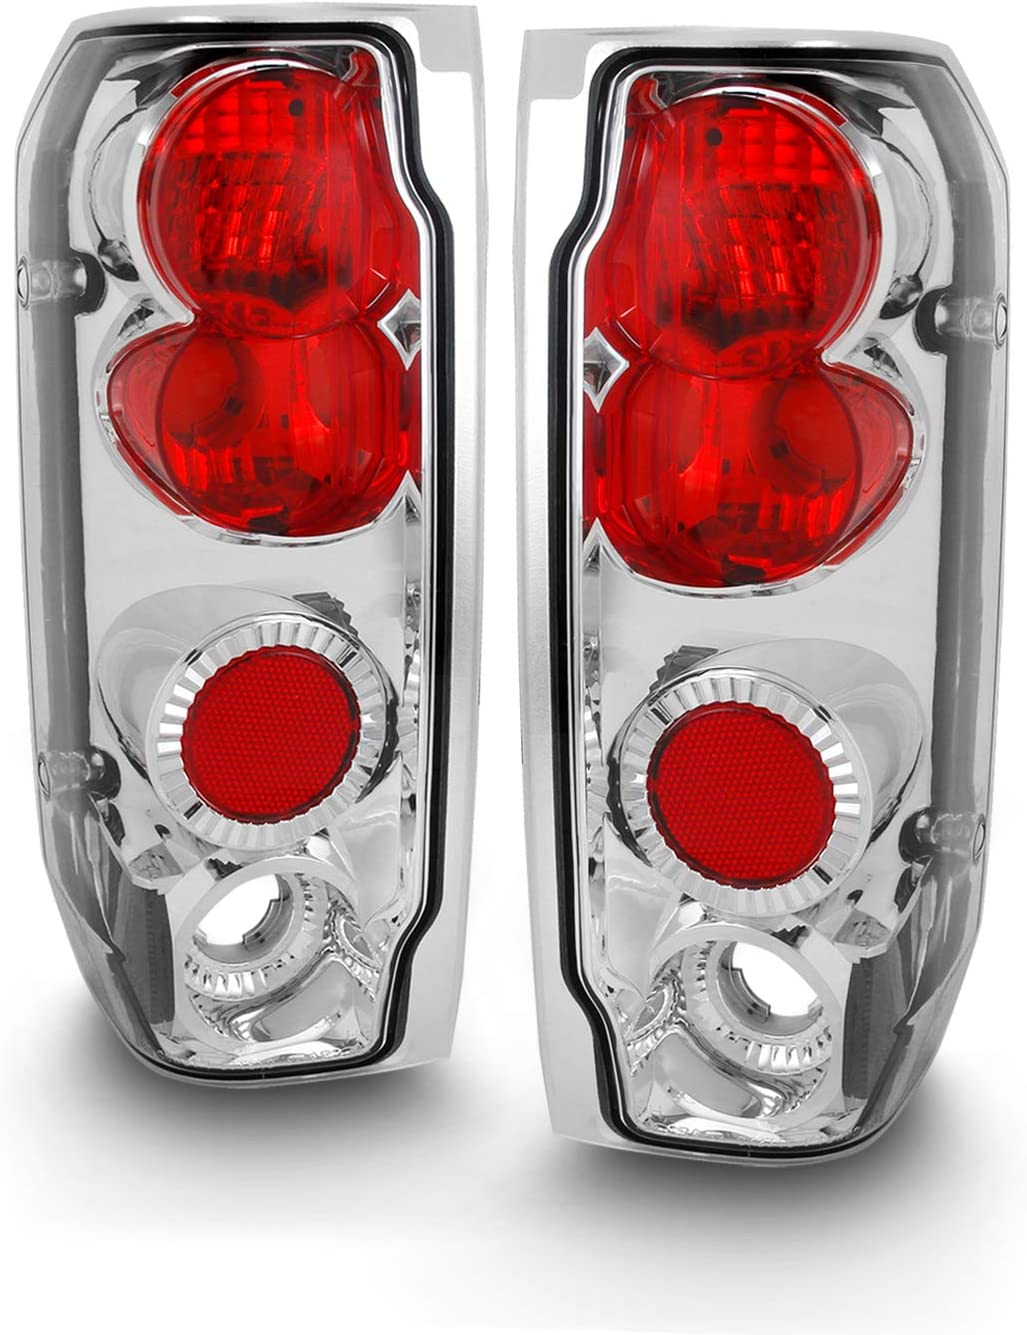 For Ford F150 F250 Bronco I Pickup Truck Black Bezel Rear Tail Lights Brake Driver//Passenger Lamps